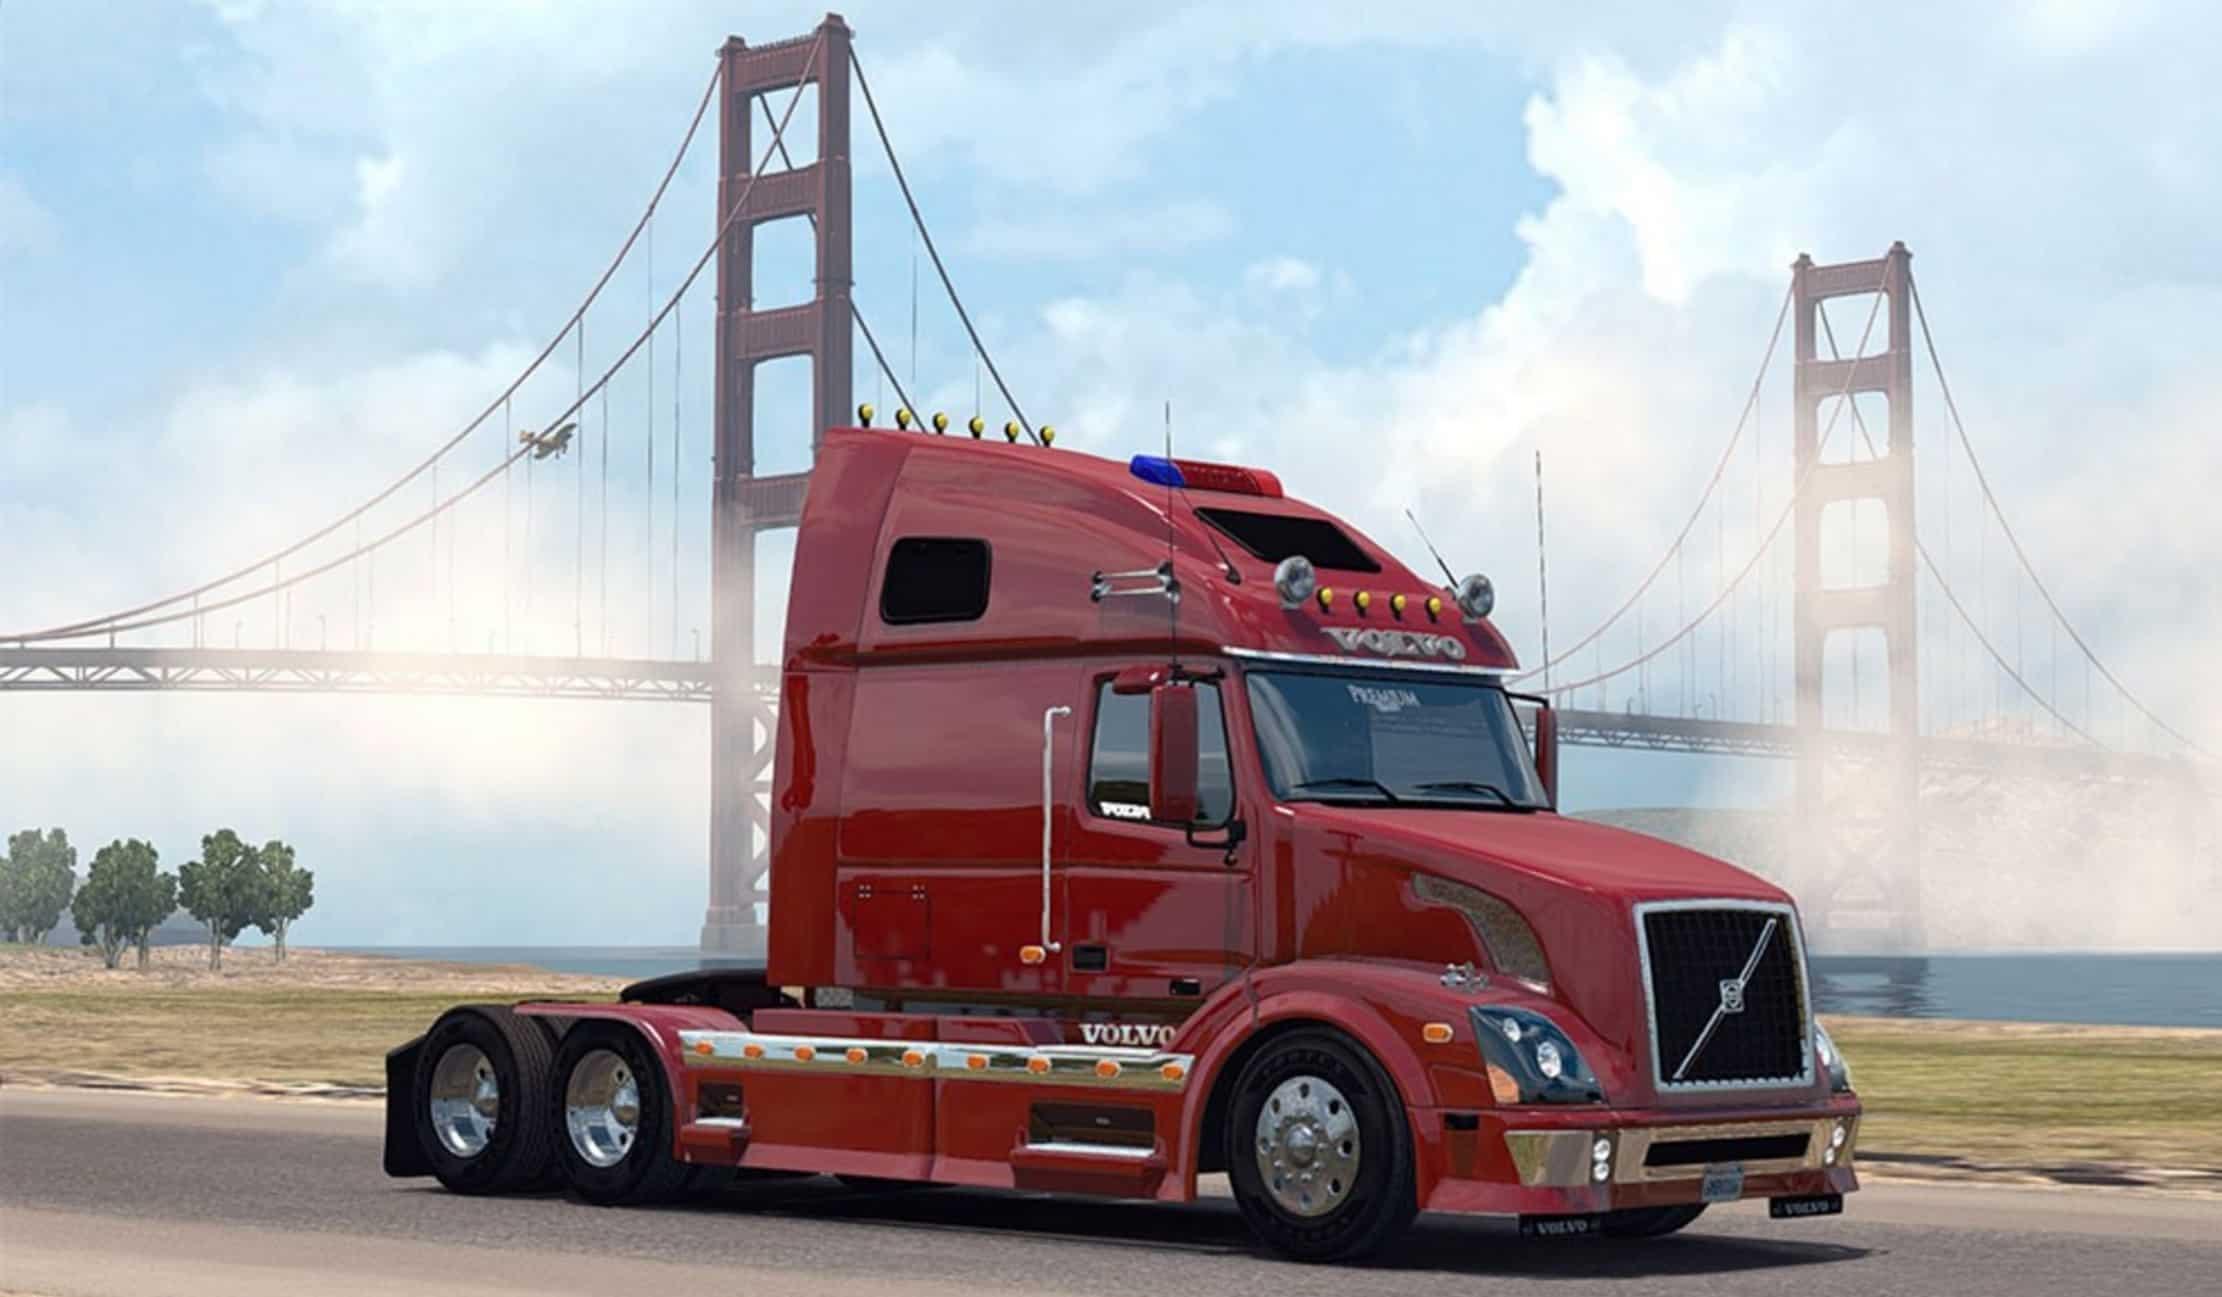 semi and for duty phoenix used volvo sale westoz truck trucks arizona provided salvage has parts heavy